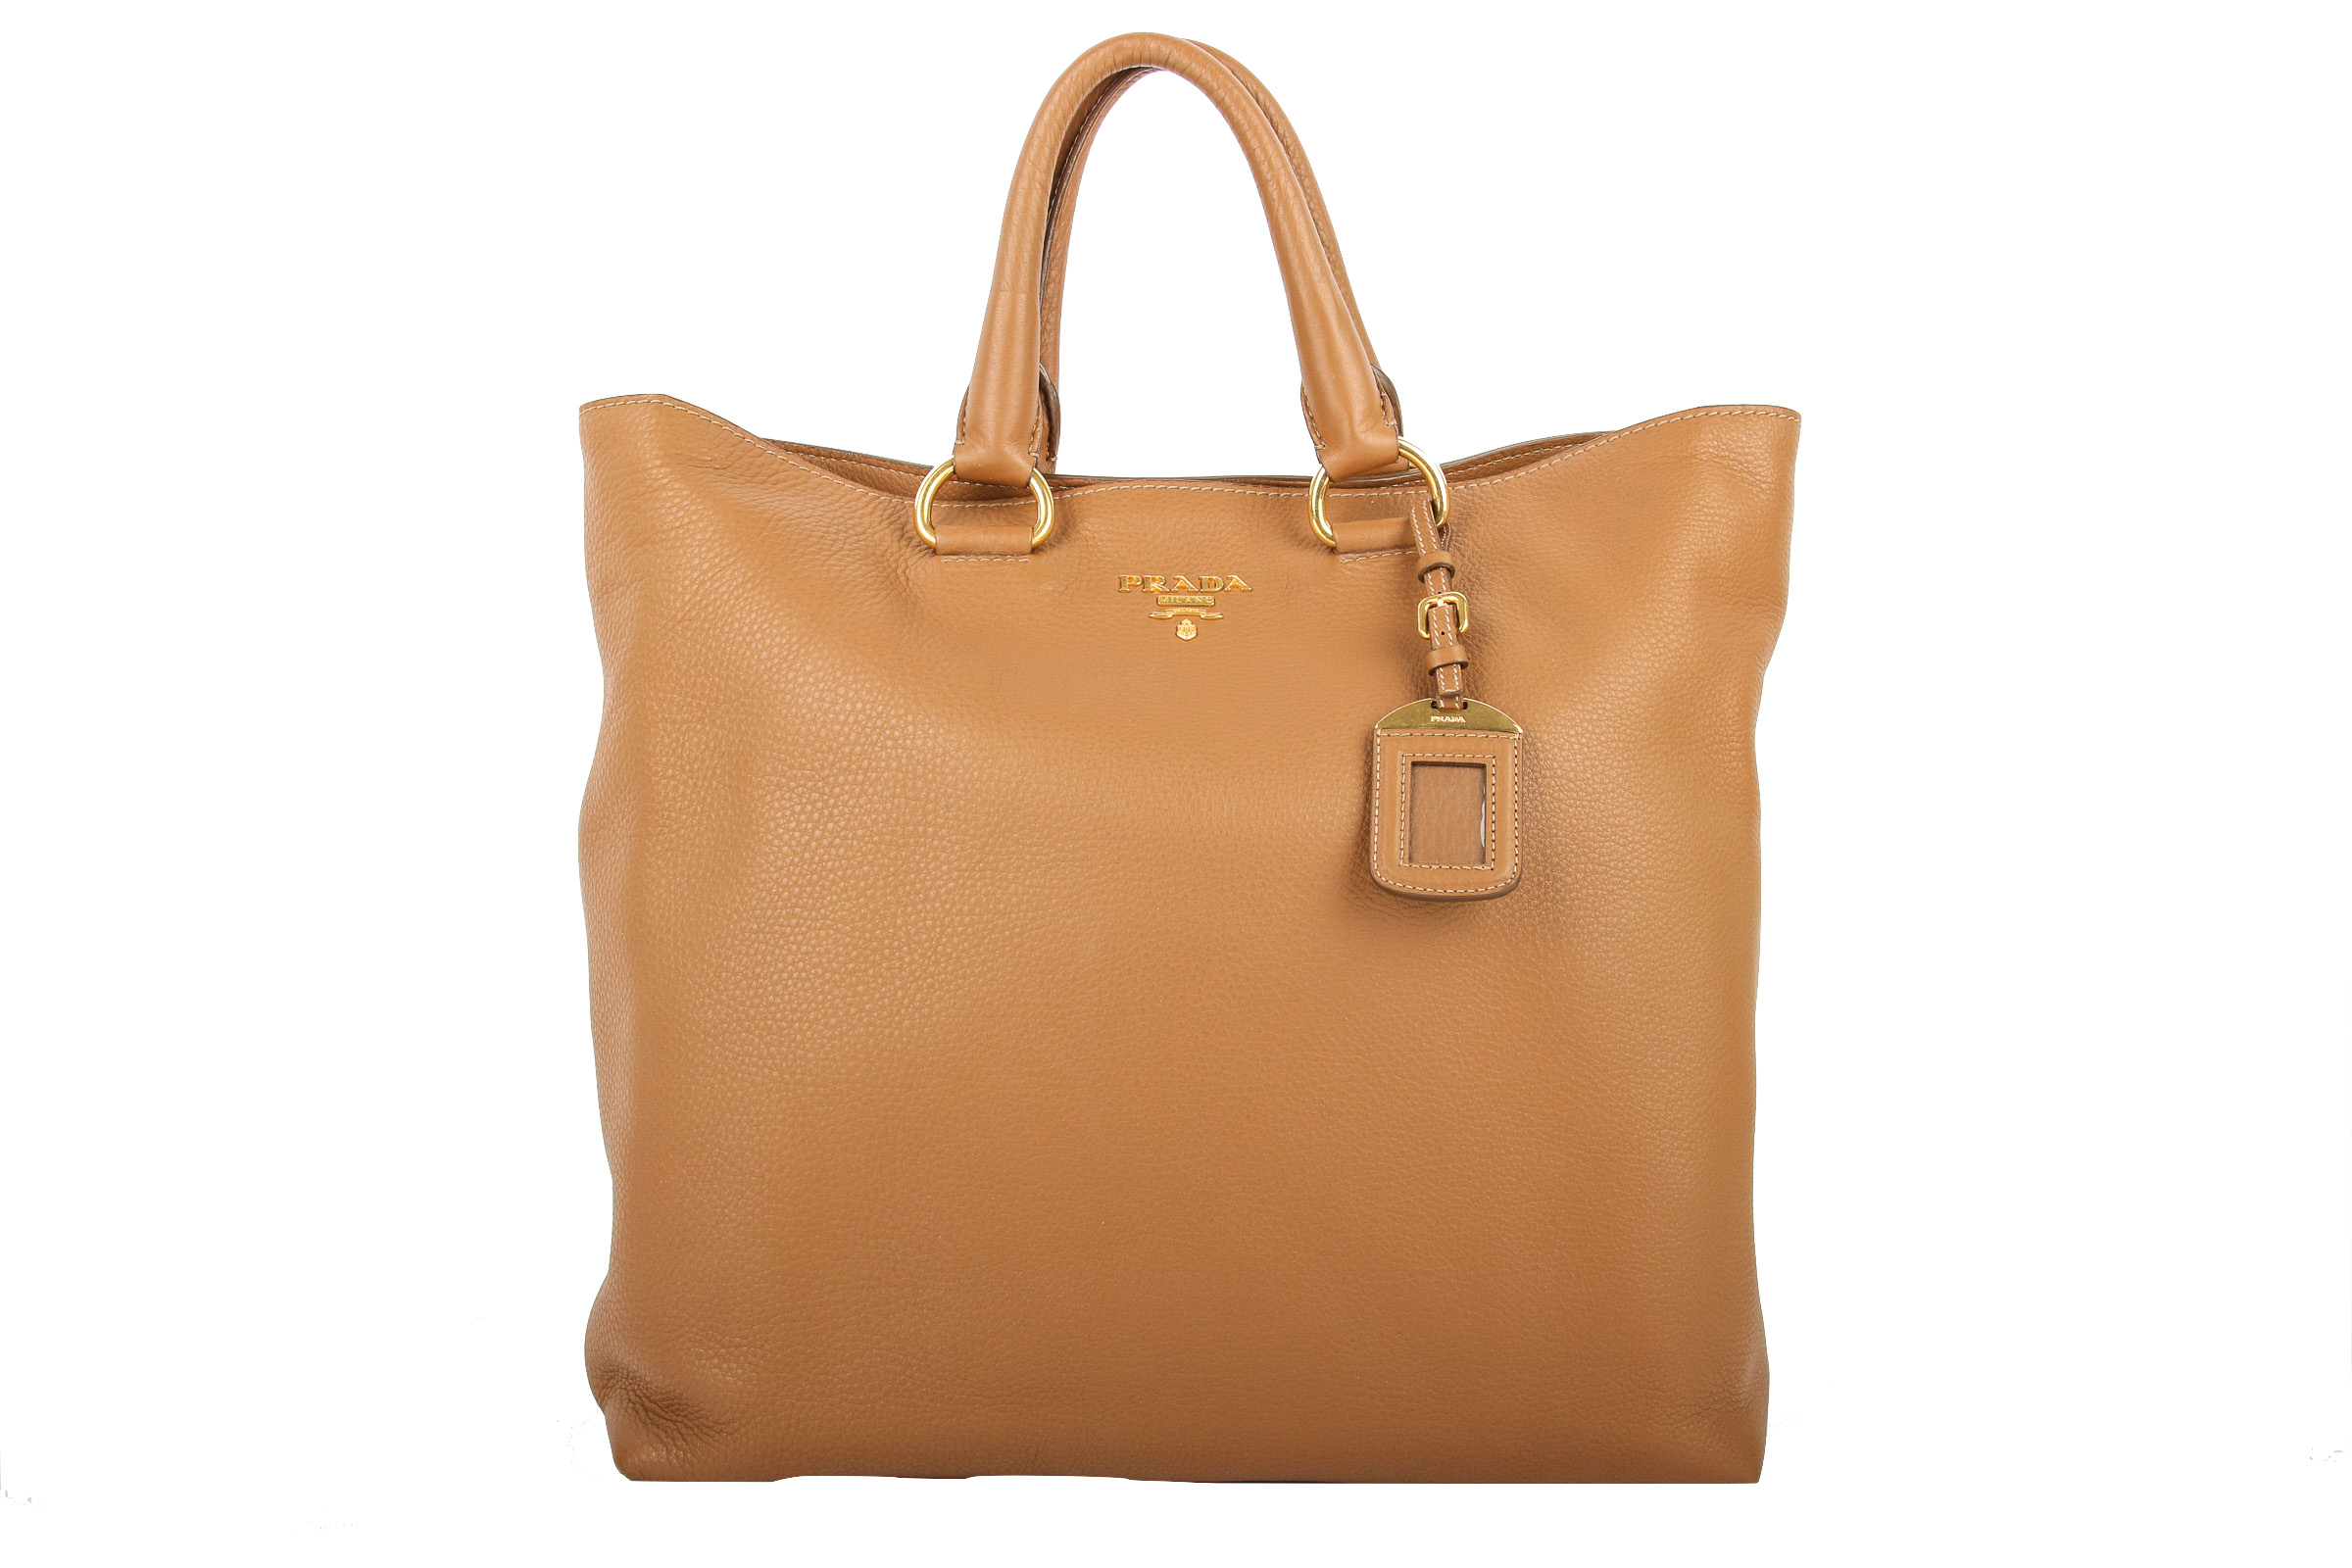 379bae9feb429 Prada Handtaschen   Accessoires